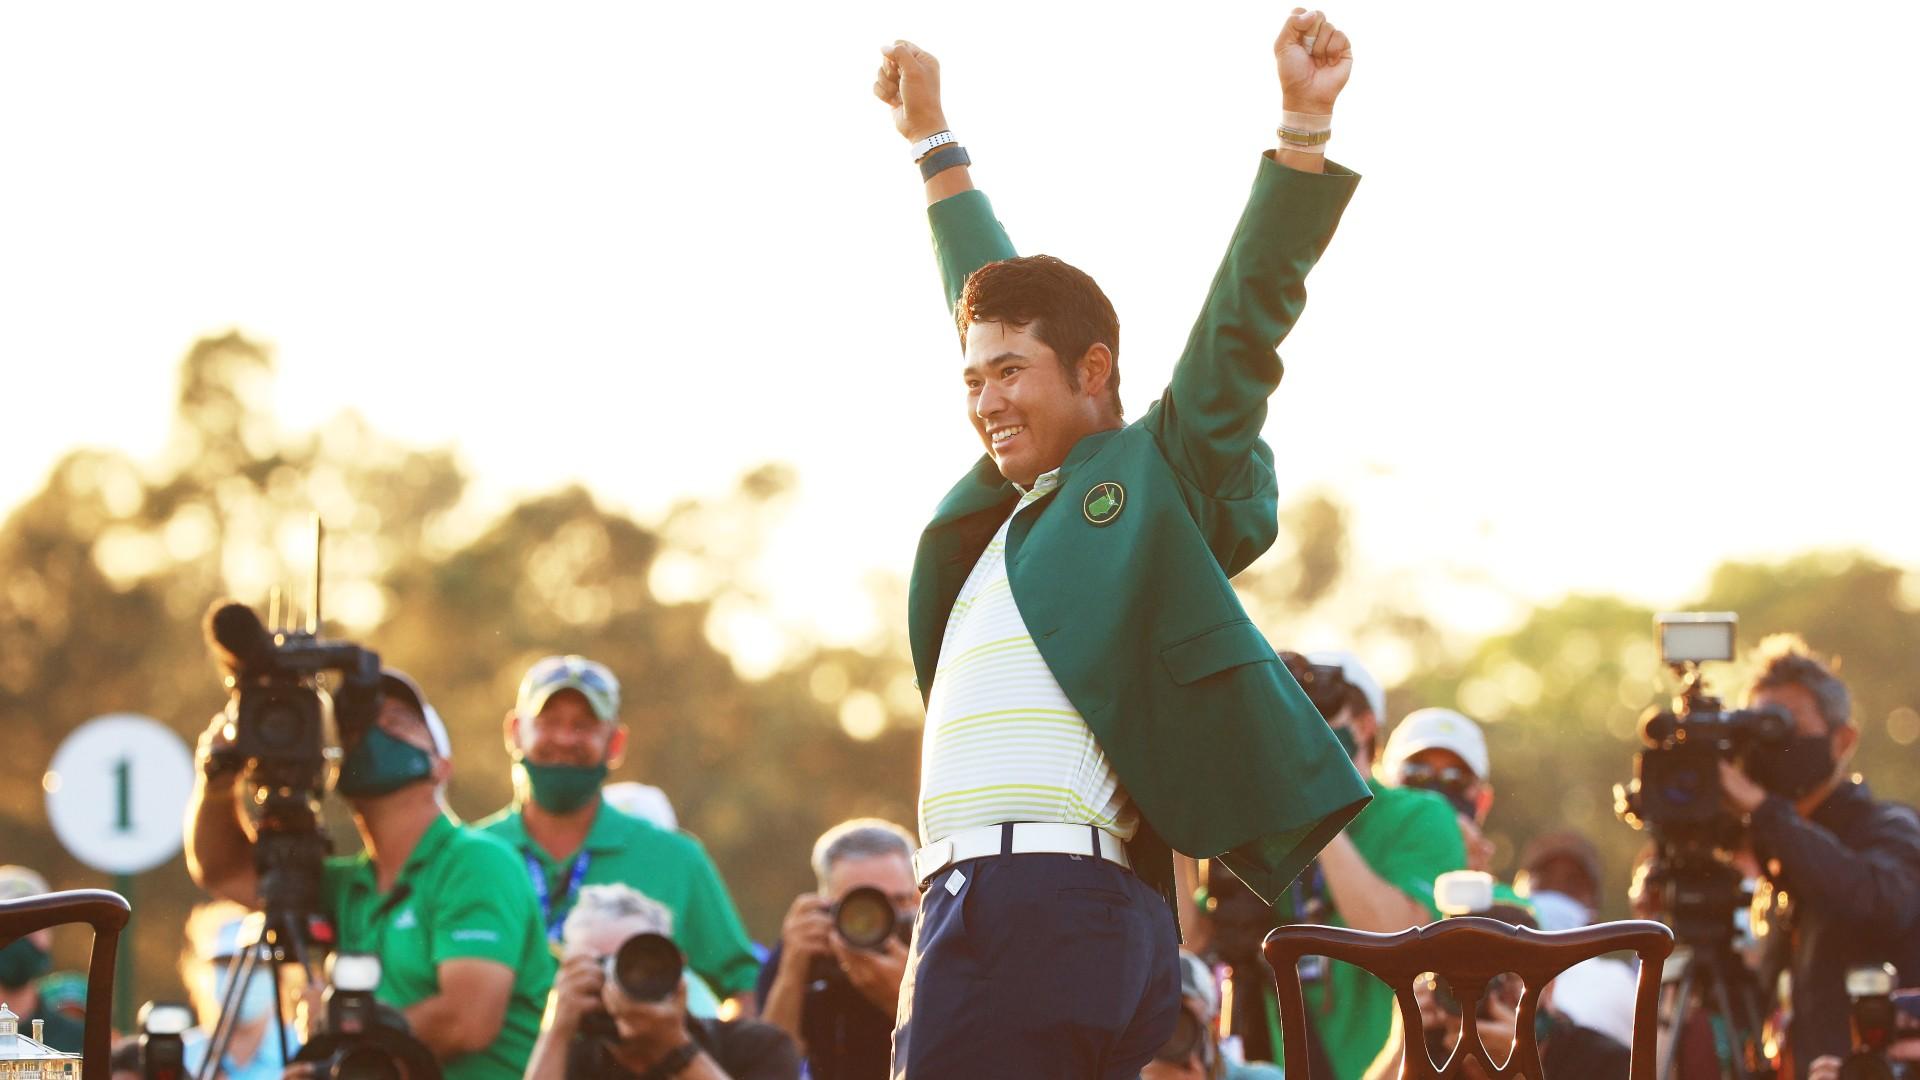 The Masters: Tiger Woods congratulates history-making Matsuyama